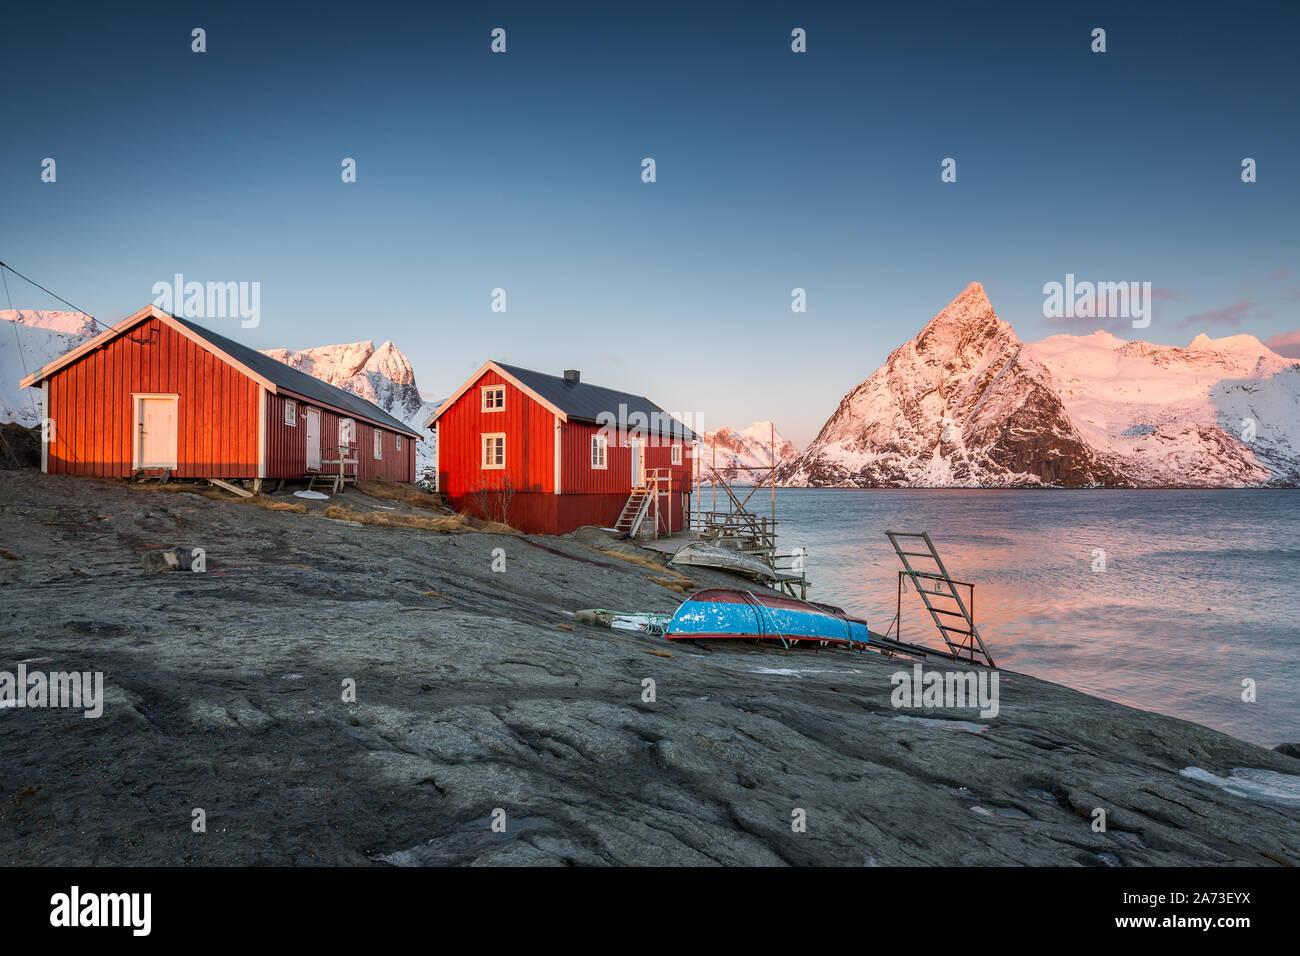 Red fishermen's huts and Olstinden mountain, Lofoten, Norway Stock Photo